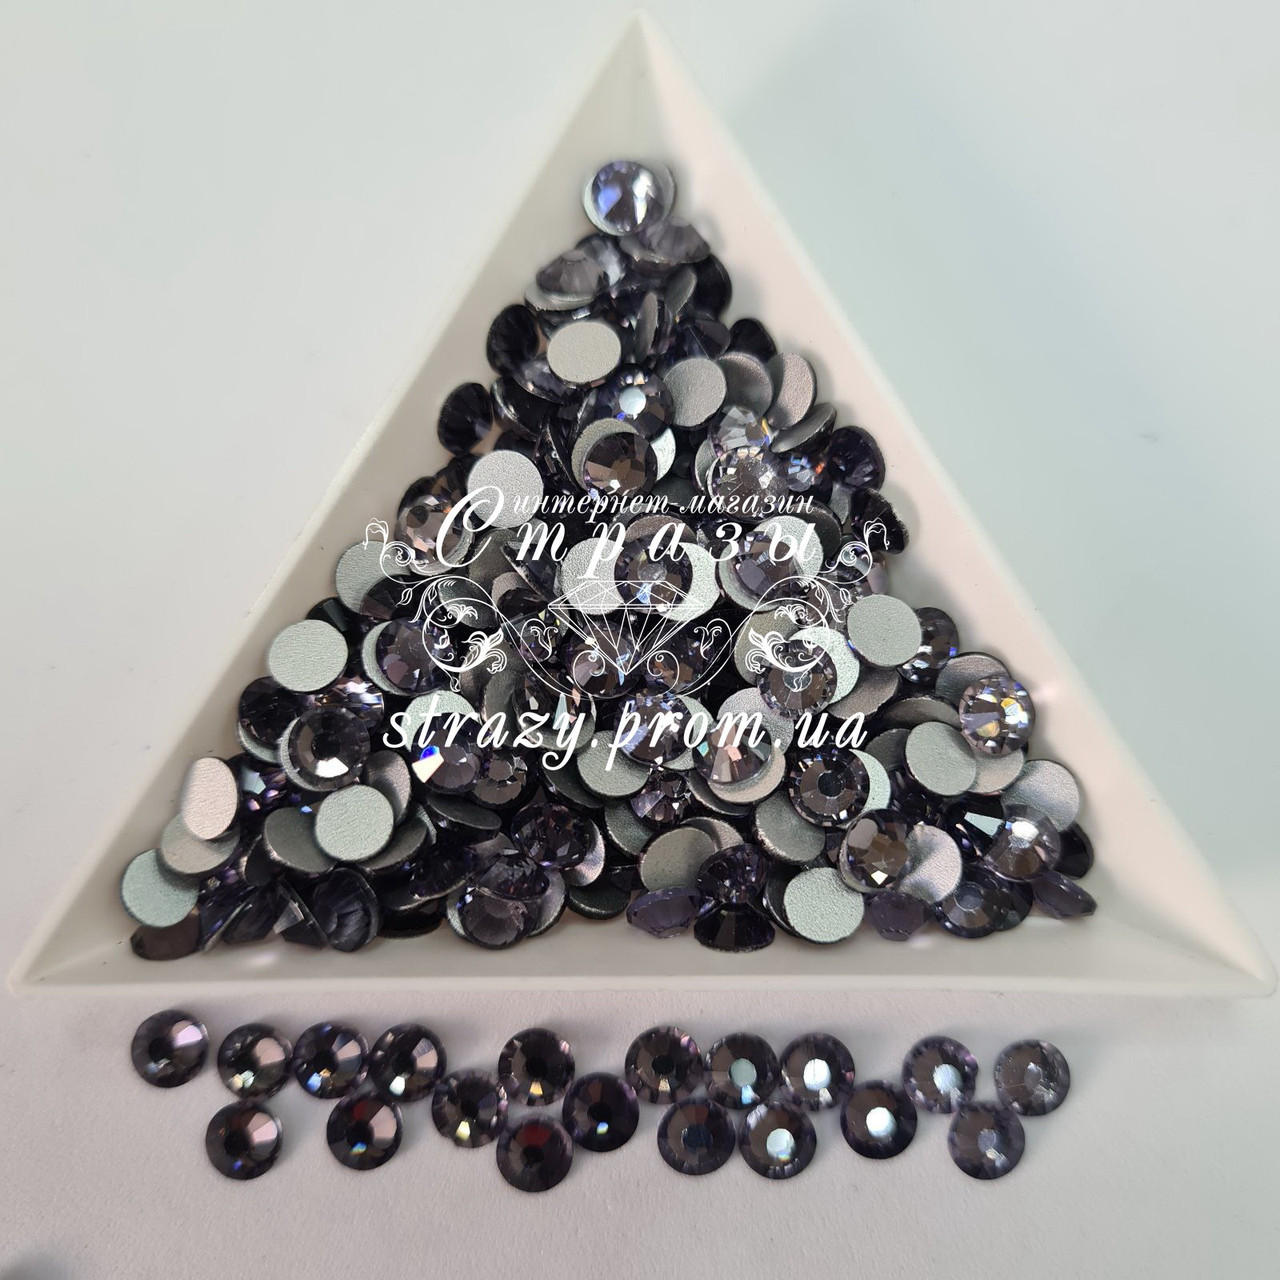 "Стразы ss30 Tanzanite, 50шт, (6.5мм) ""Crystal Premium"""